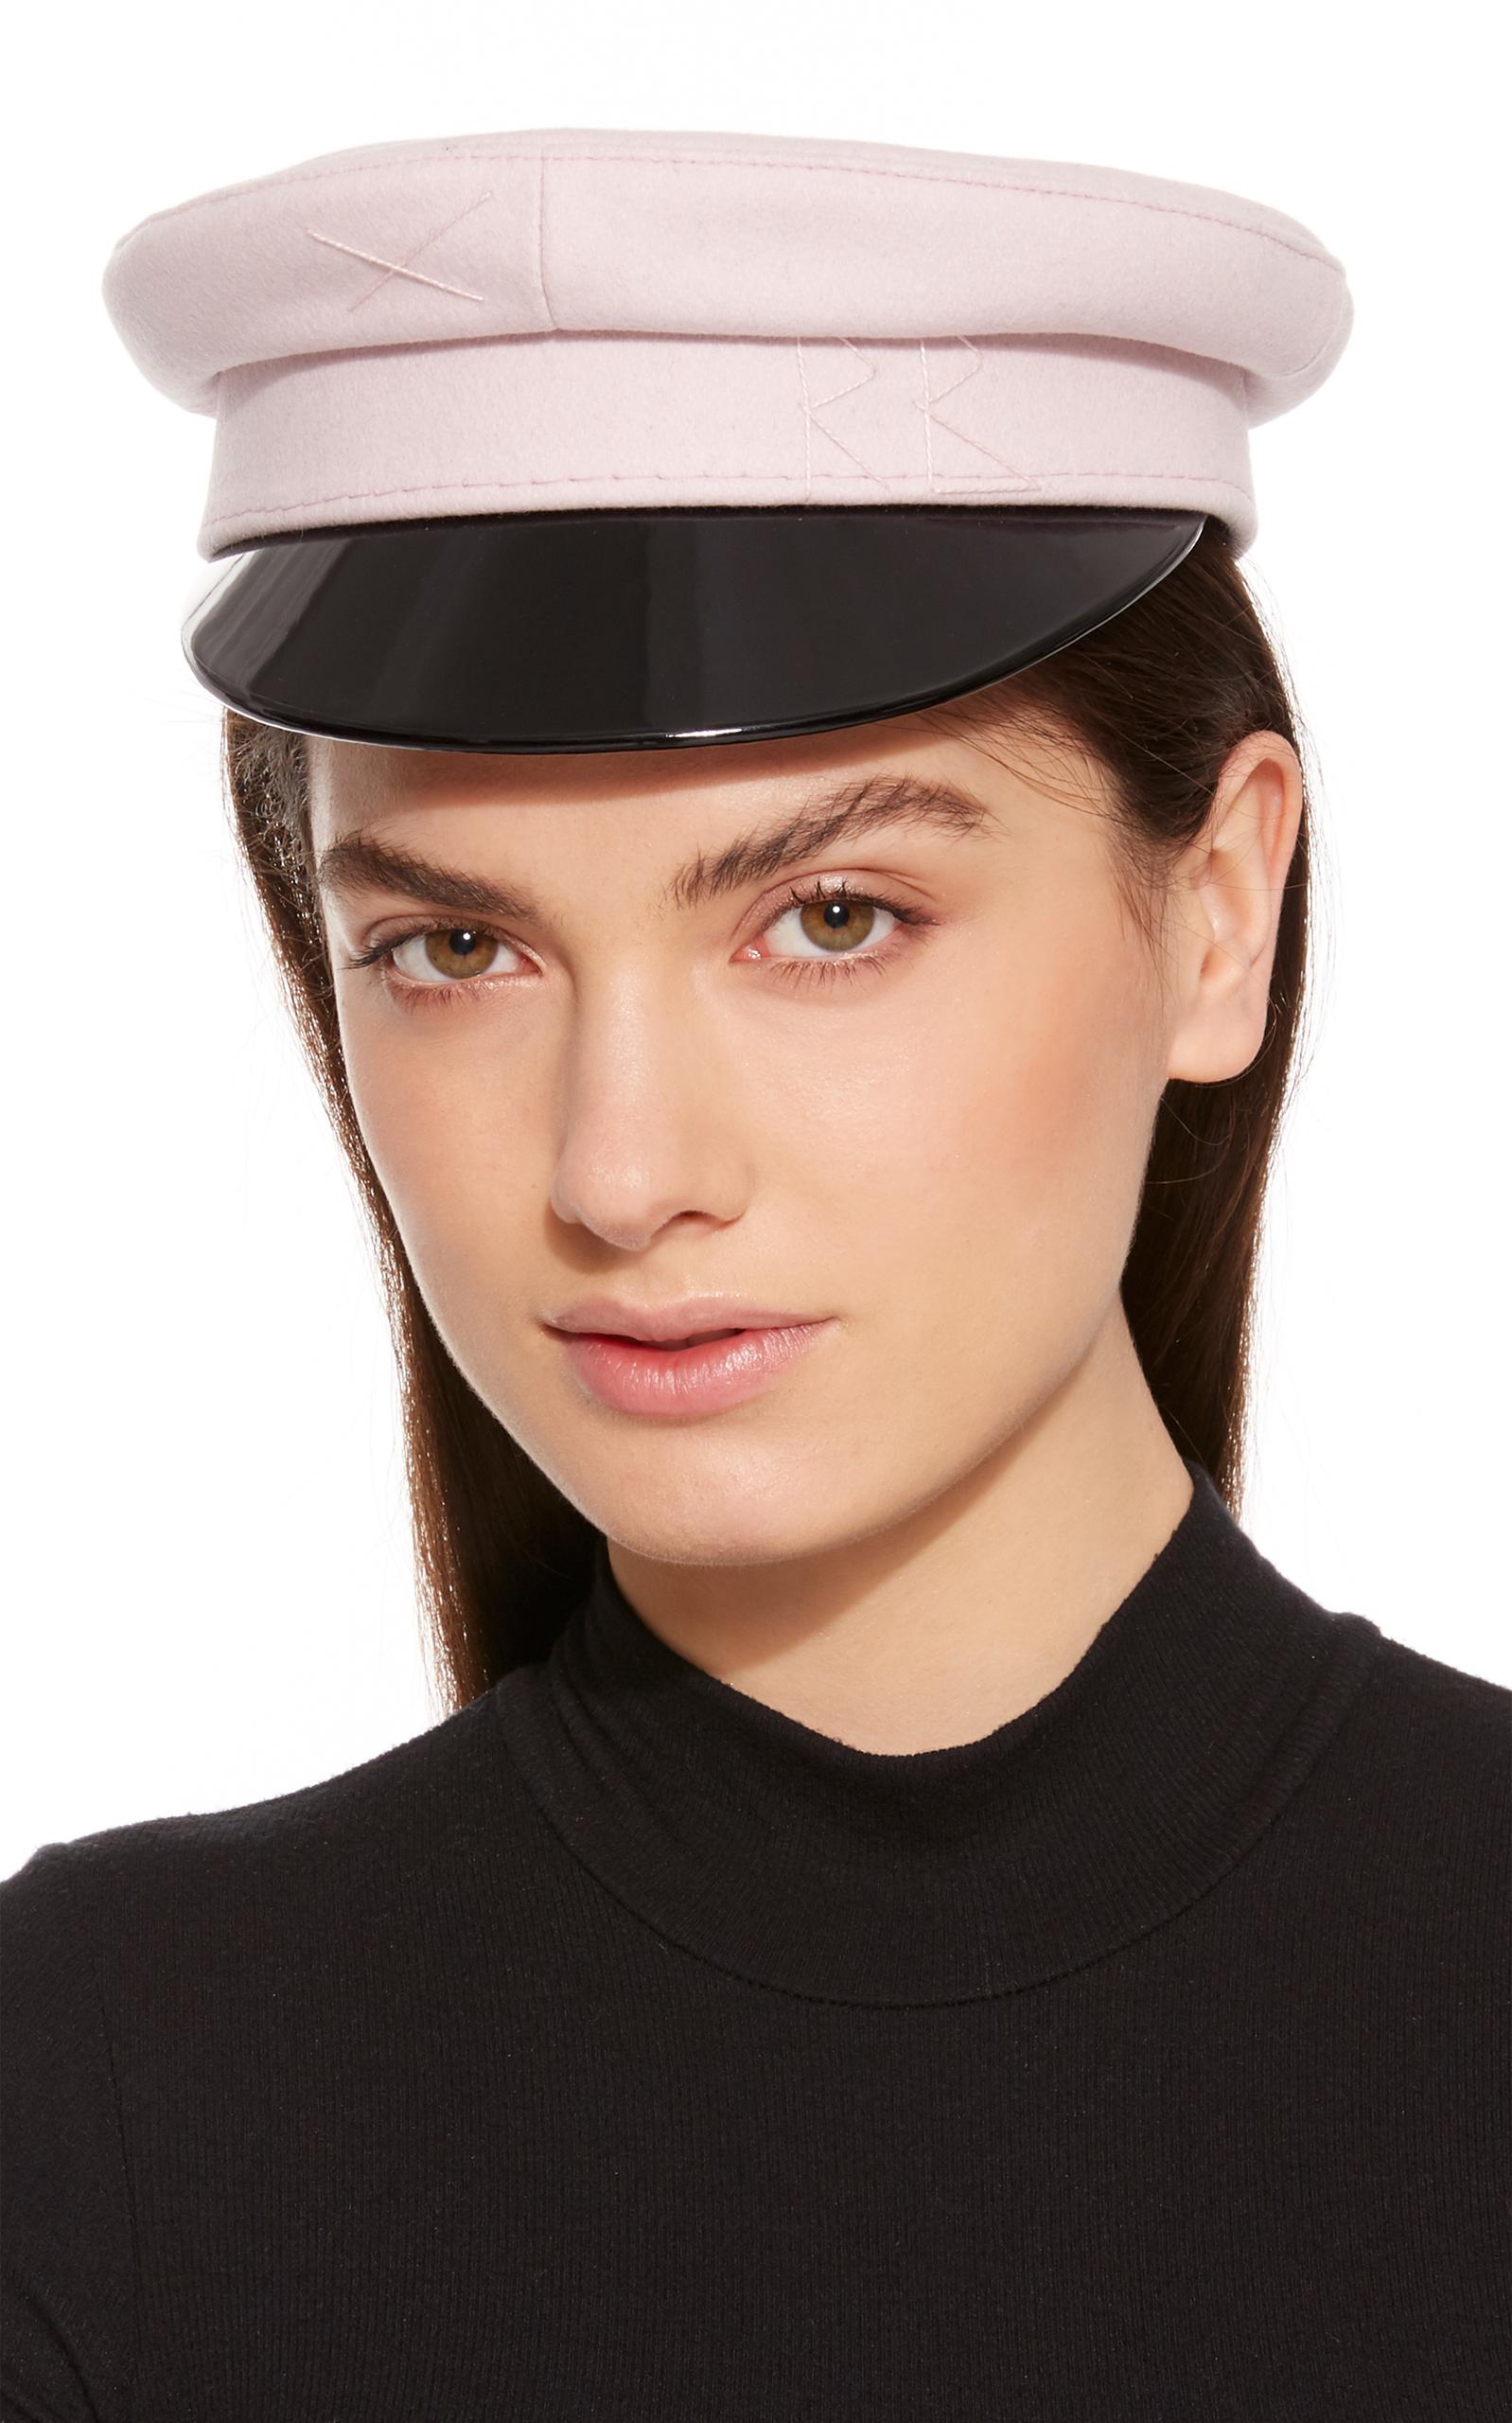 Wool Baker Boy Cap by Ruslan Baginskiy Hats  7a6224c2db0